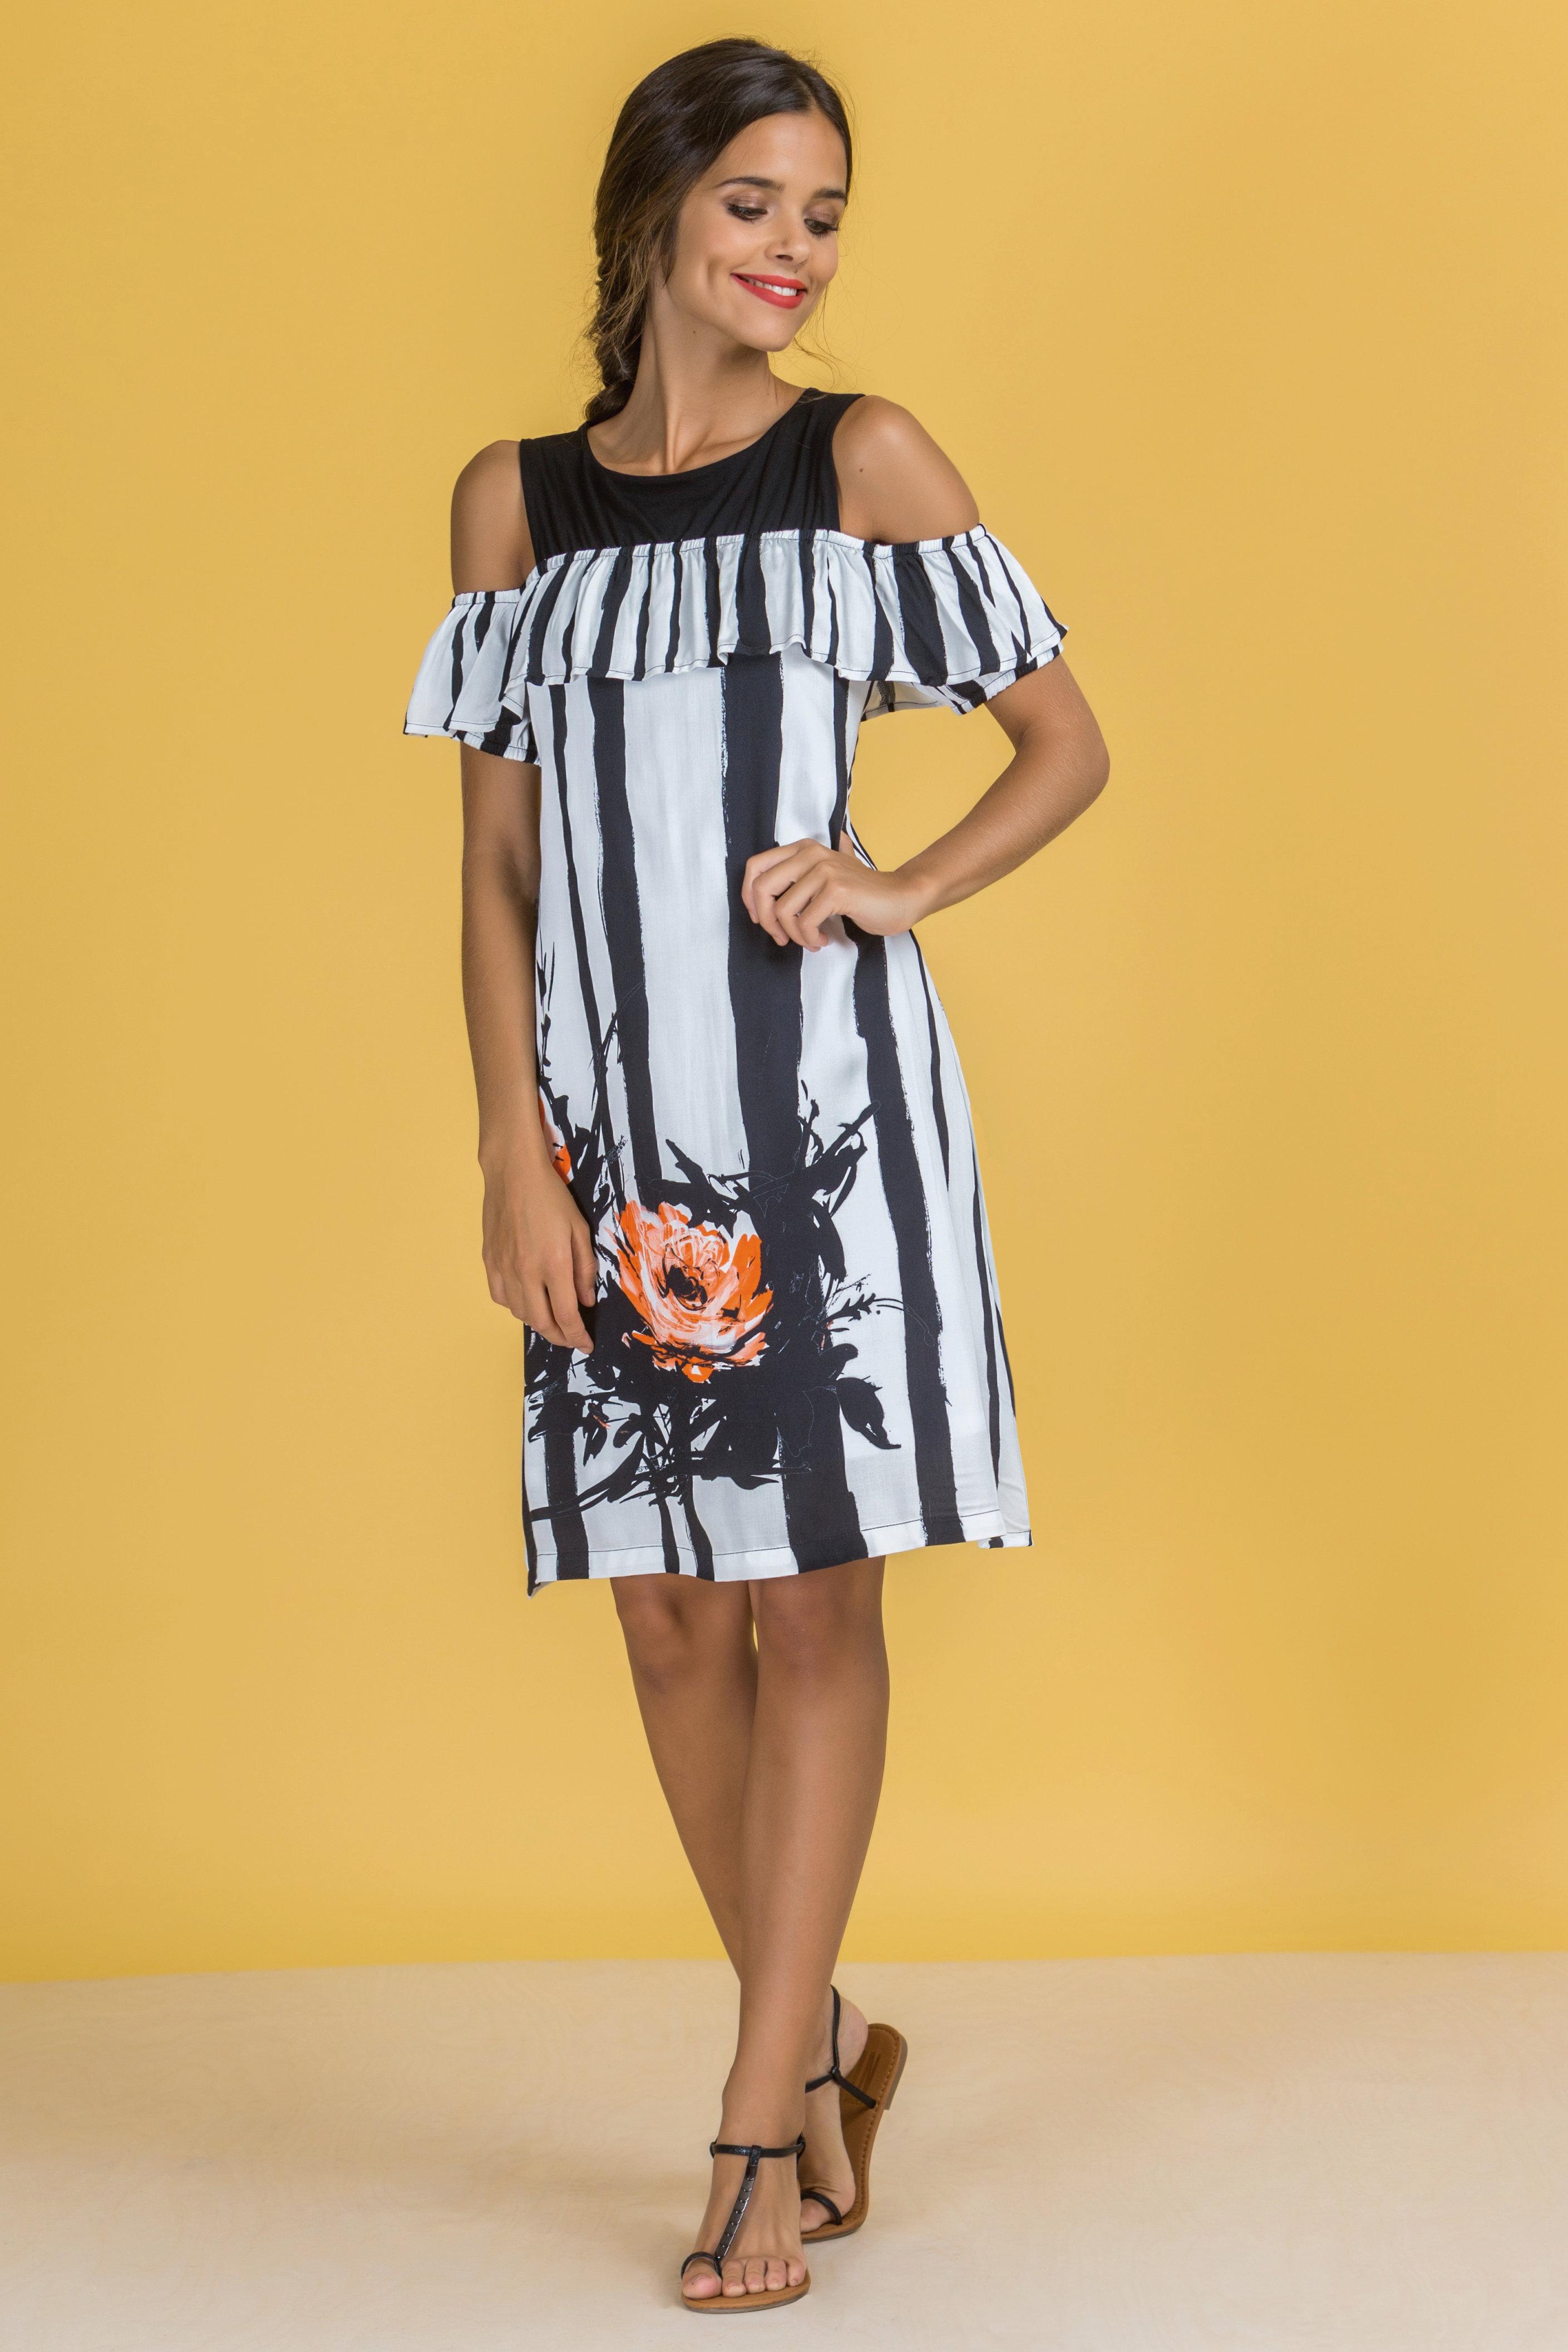 Paul Brial: Wild Orange Rose Cold Shoulder Ruffled Midi Dress PB_CHROMATIC_N